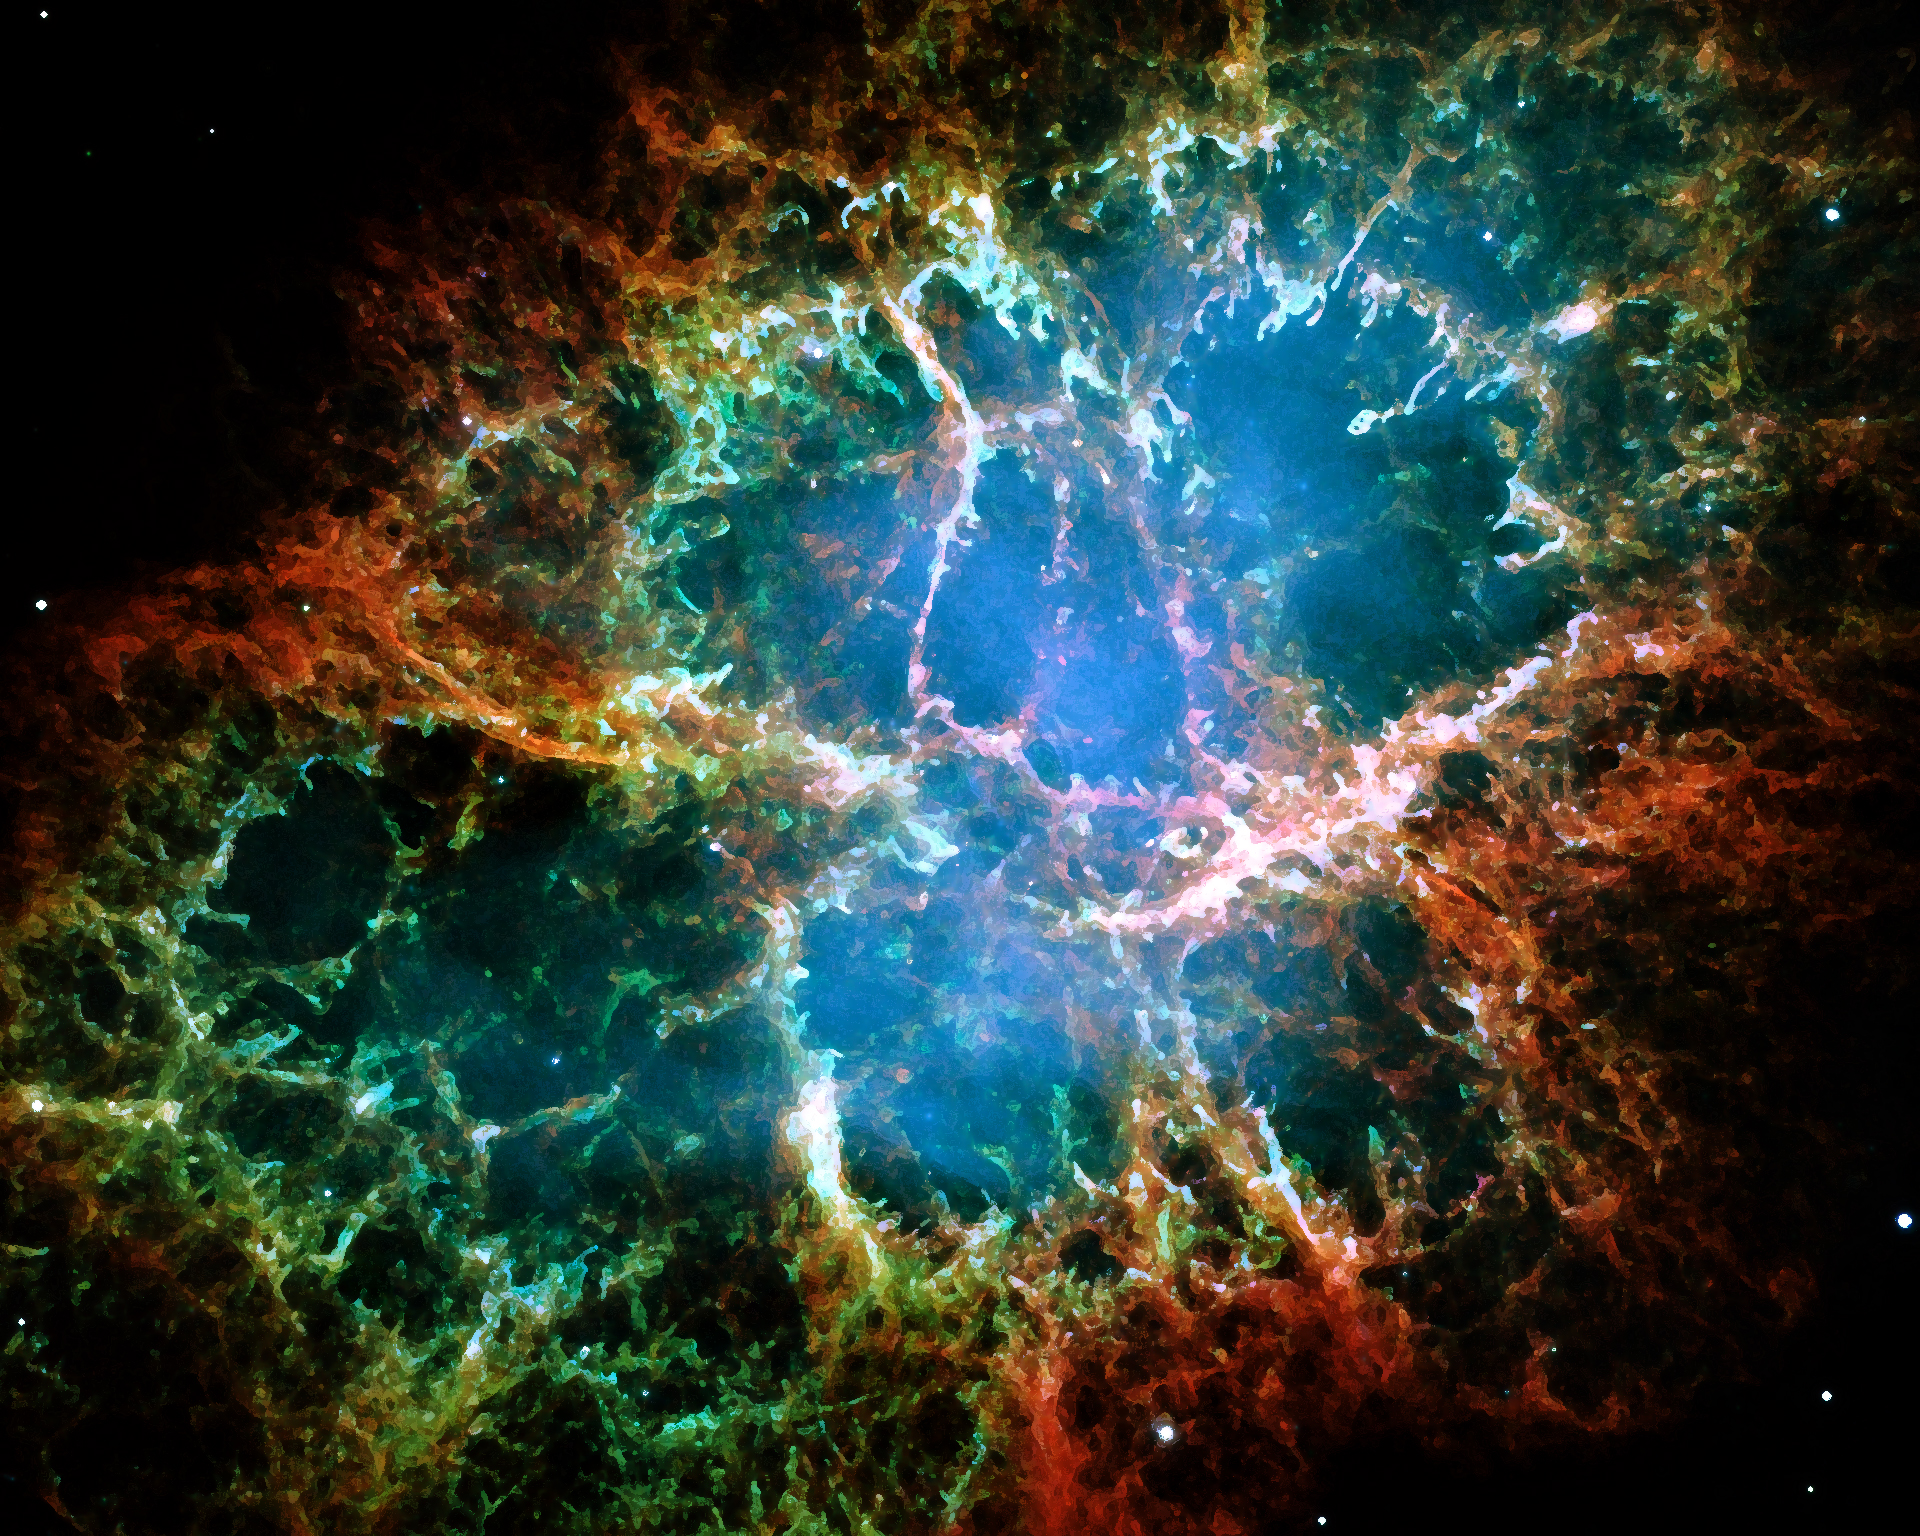 1920x1536px 916689 Crab Nebula 317573 KB 01082015 1920x1536